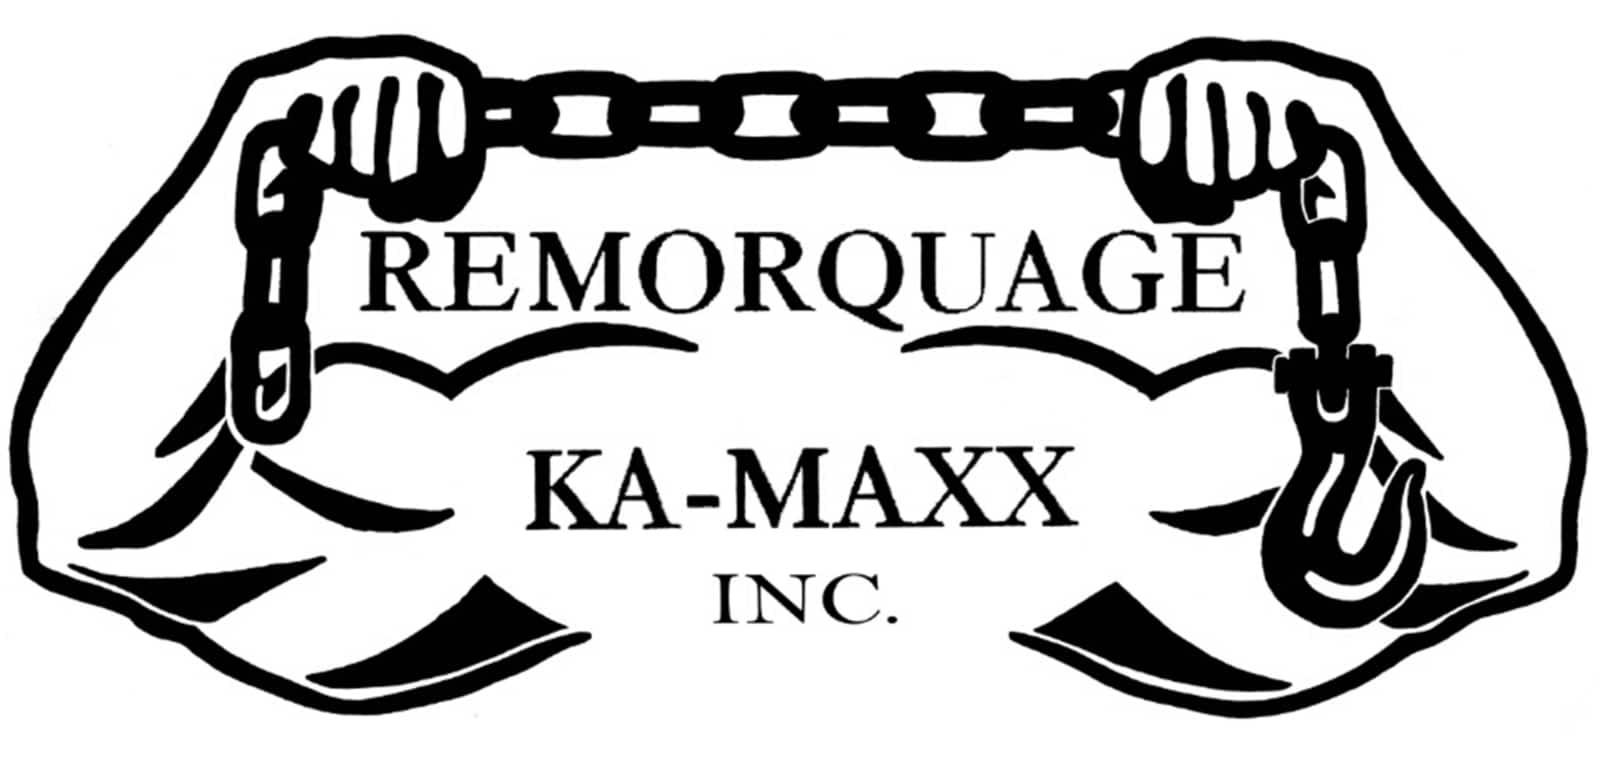 Remorquage Ka-Maxx Inc. - Horaire d\'ouverture - Amos, QC